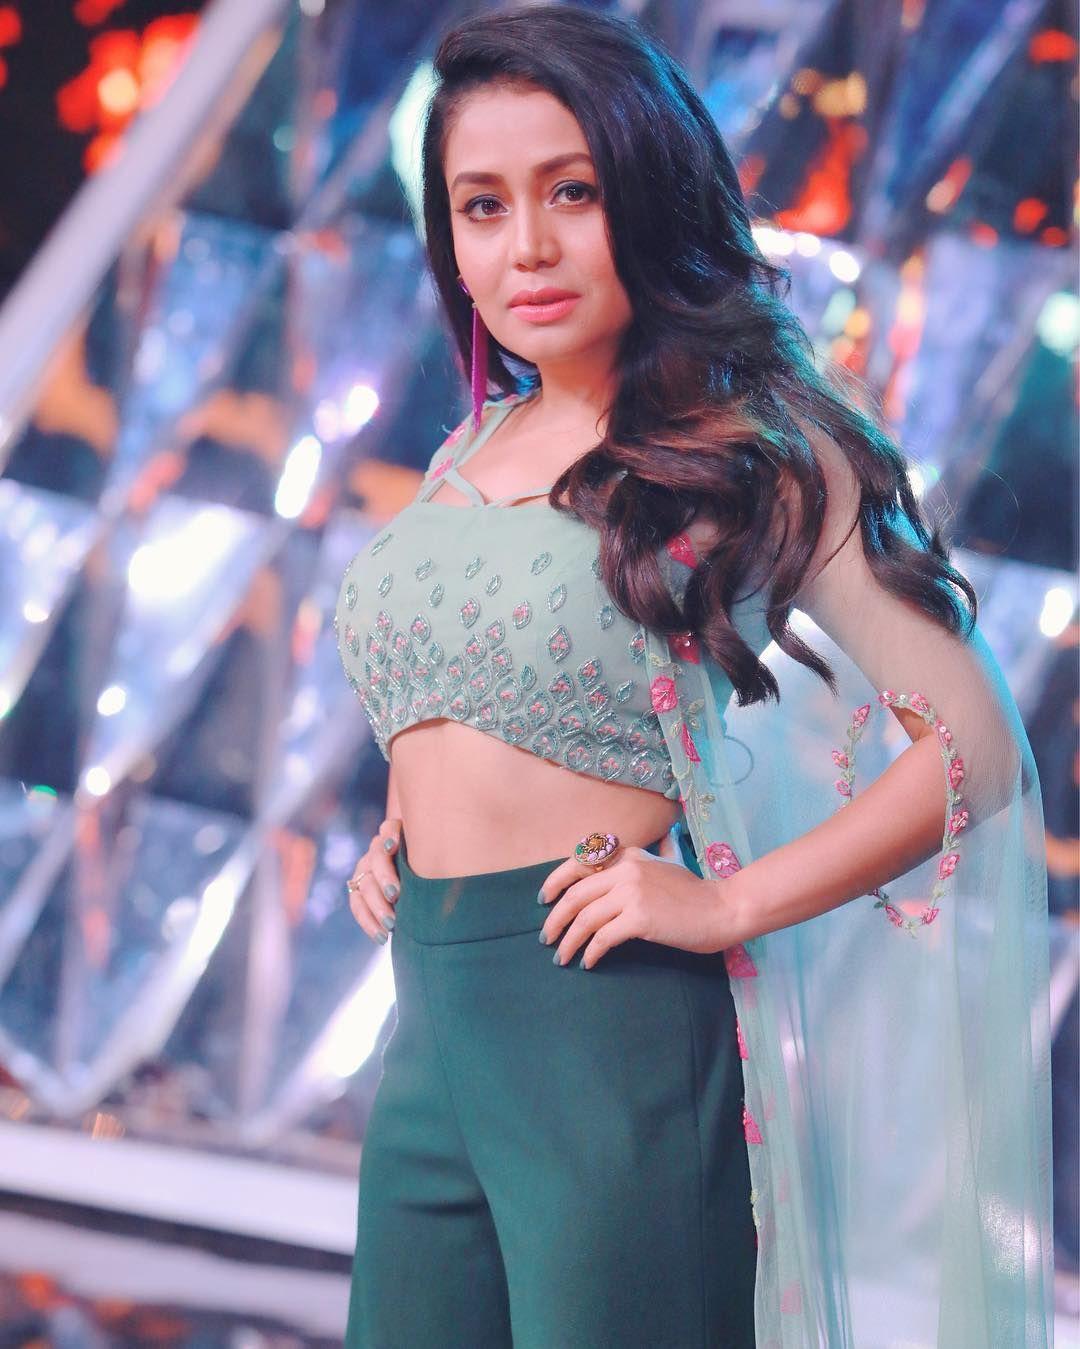 ladki aankh mare neha kakkar dance video नए वीडियो में